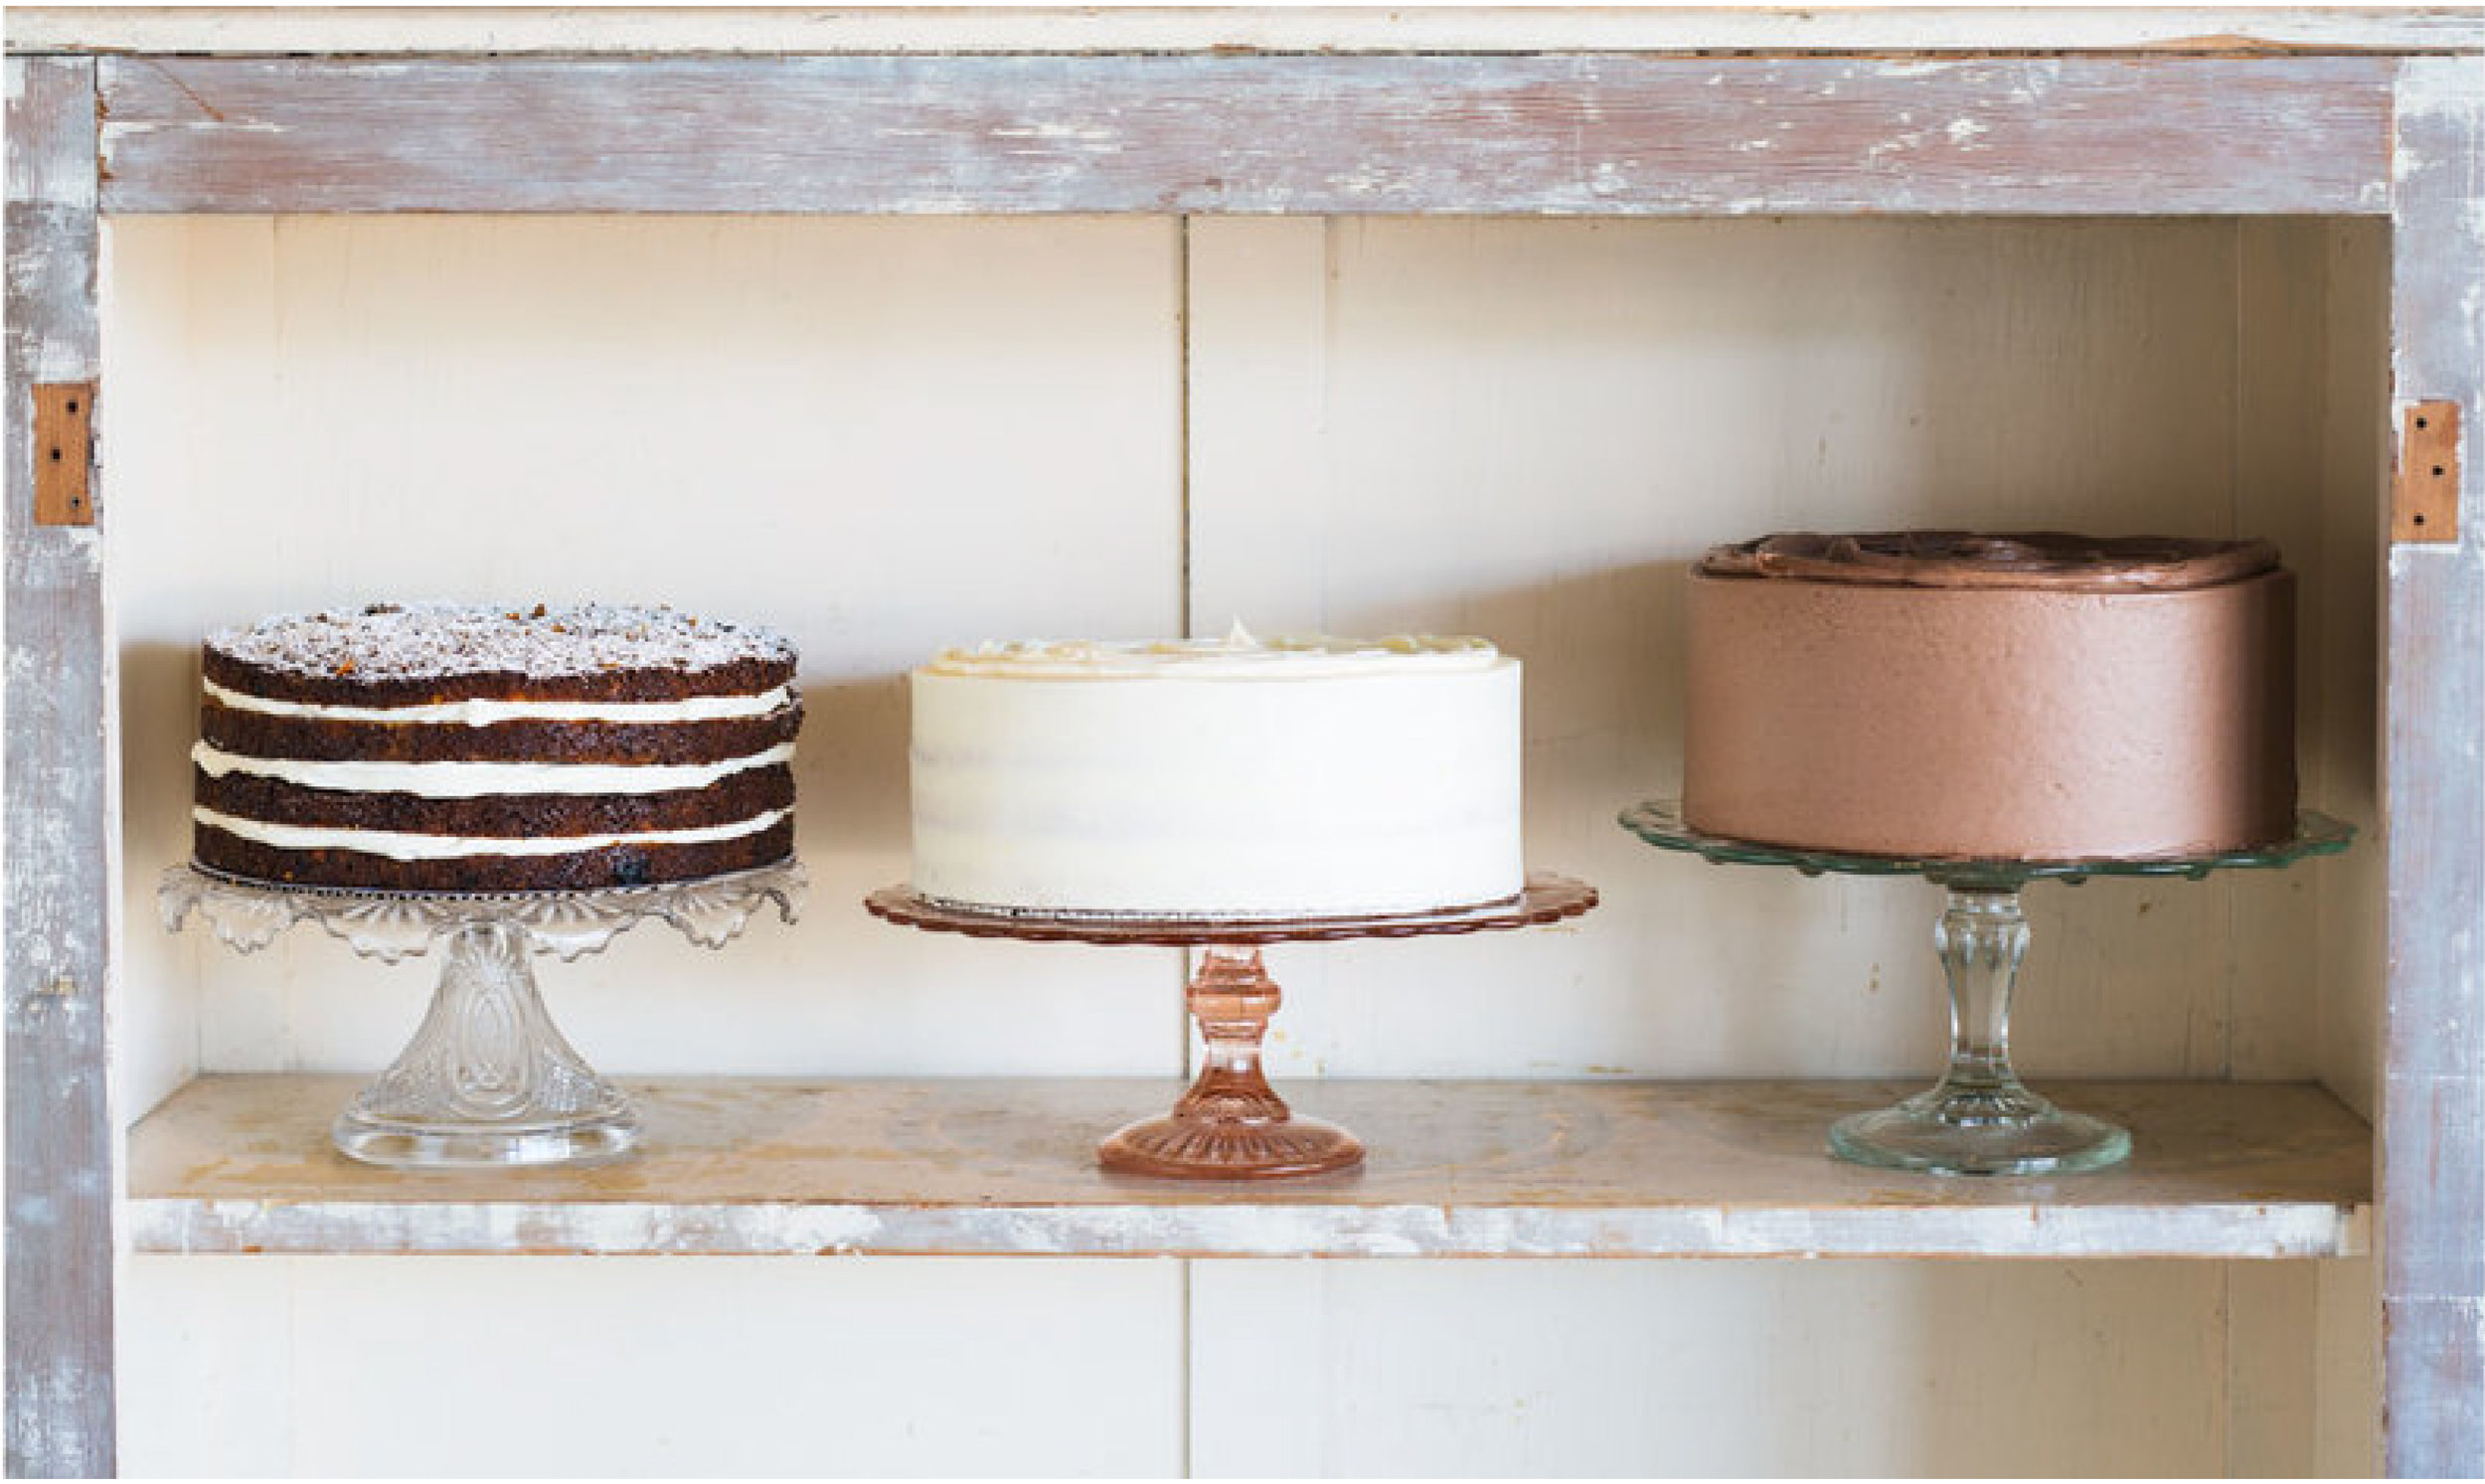 coyles bakeshop three cakes